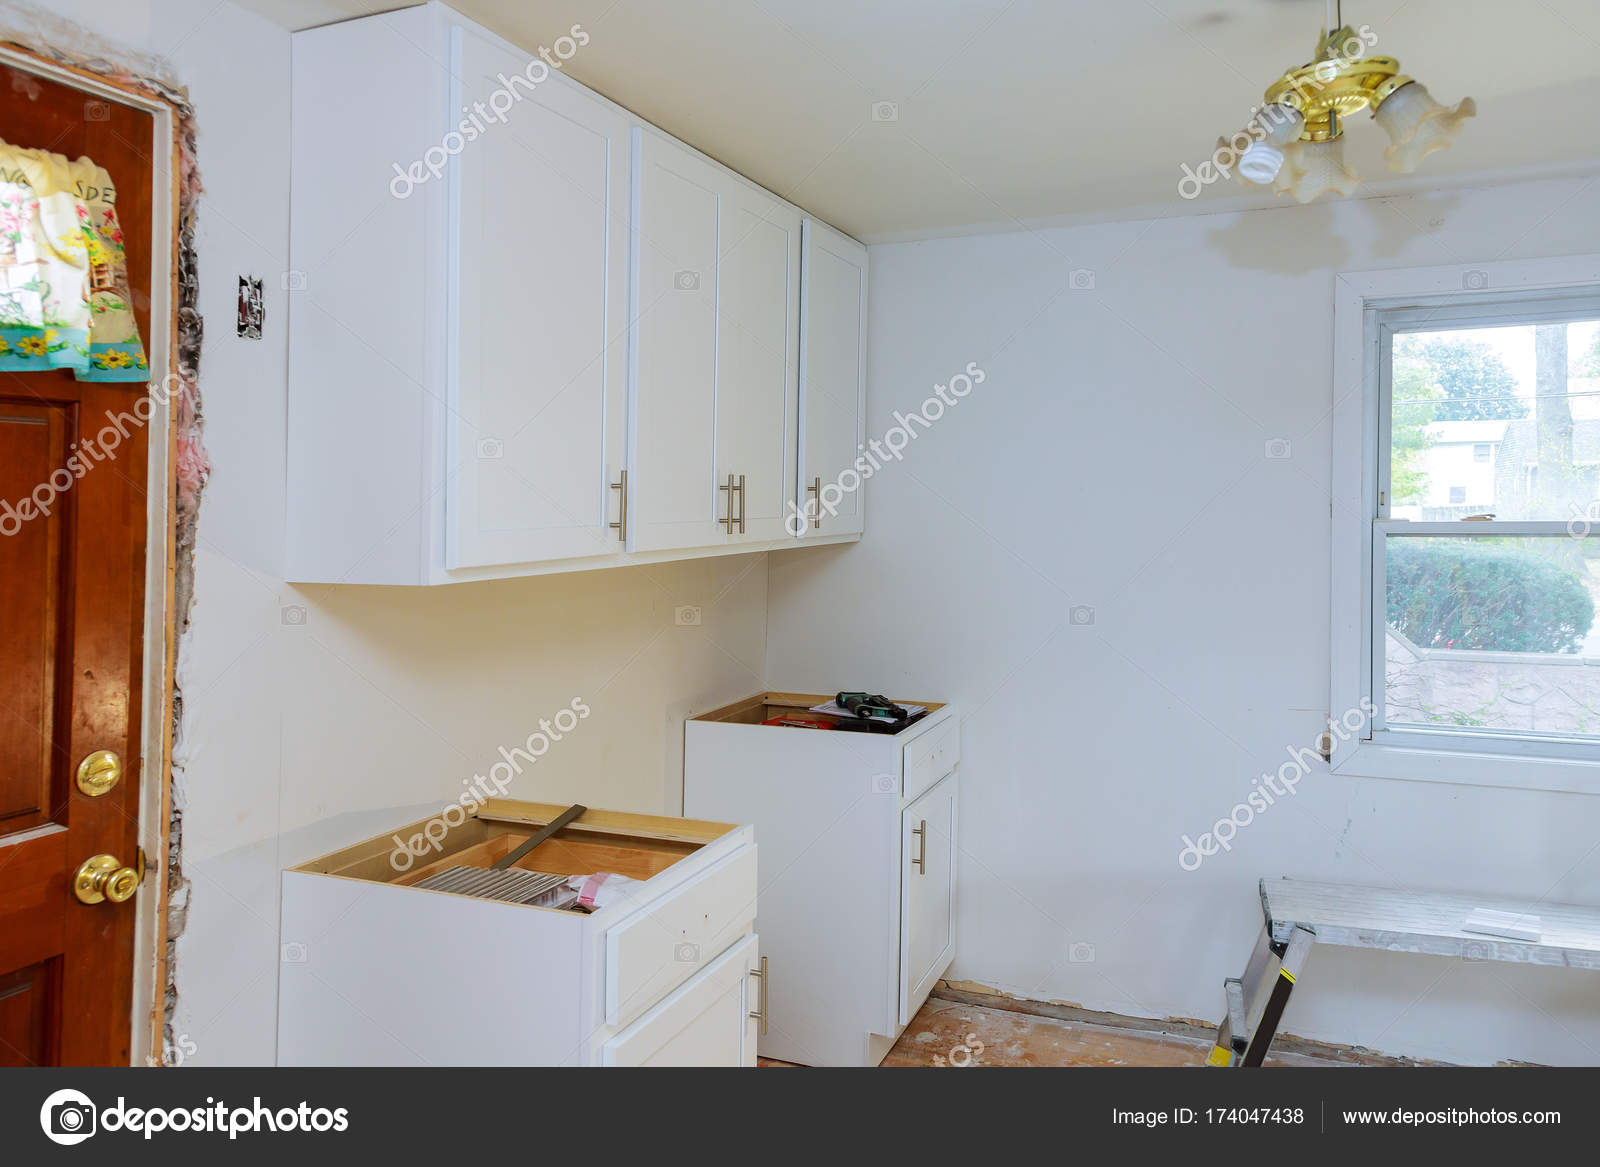 Installing New Modern Kitchen Setup Cabinate Kitchen Stock Photo